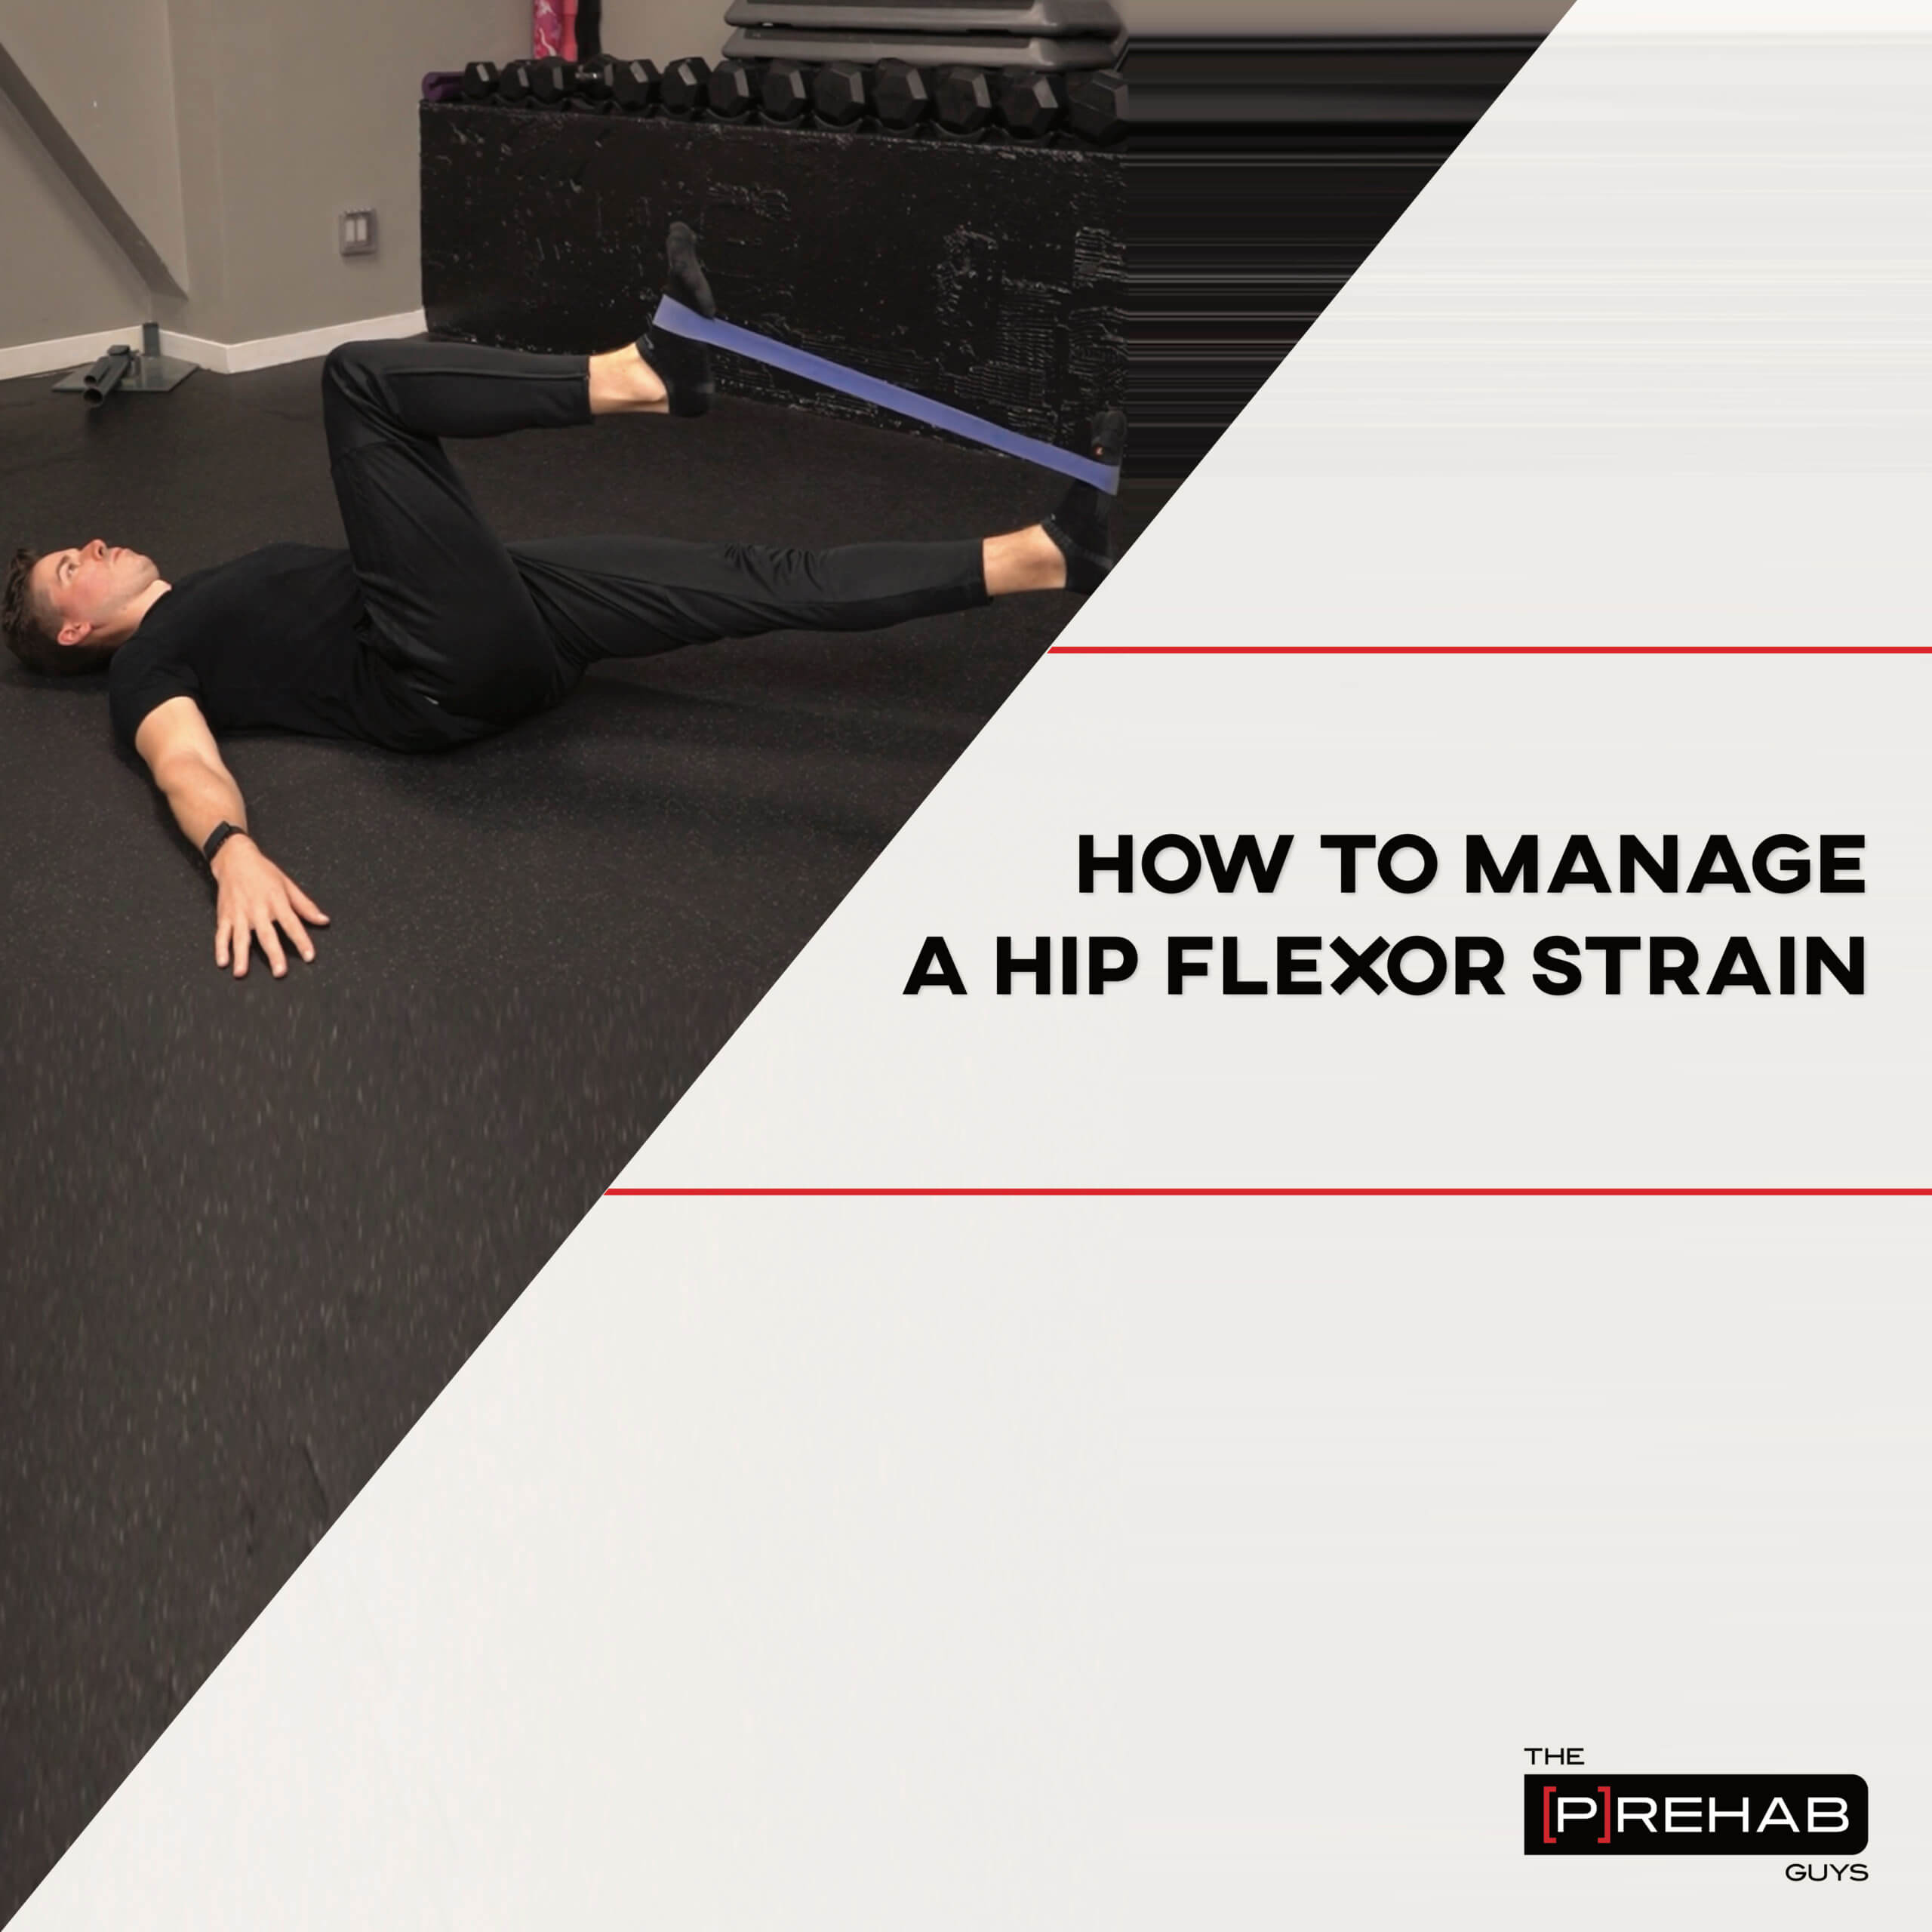 hip flexor strain workout the prehab guys